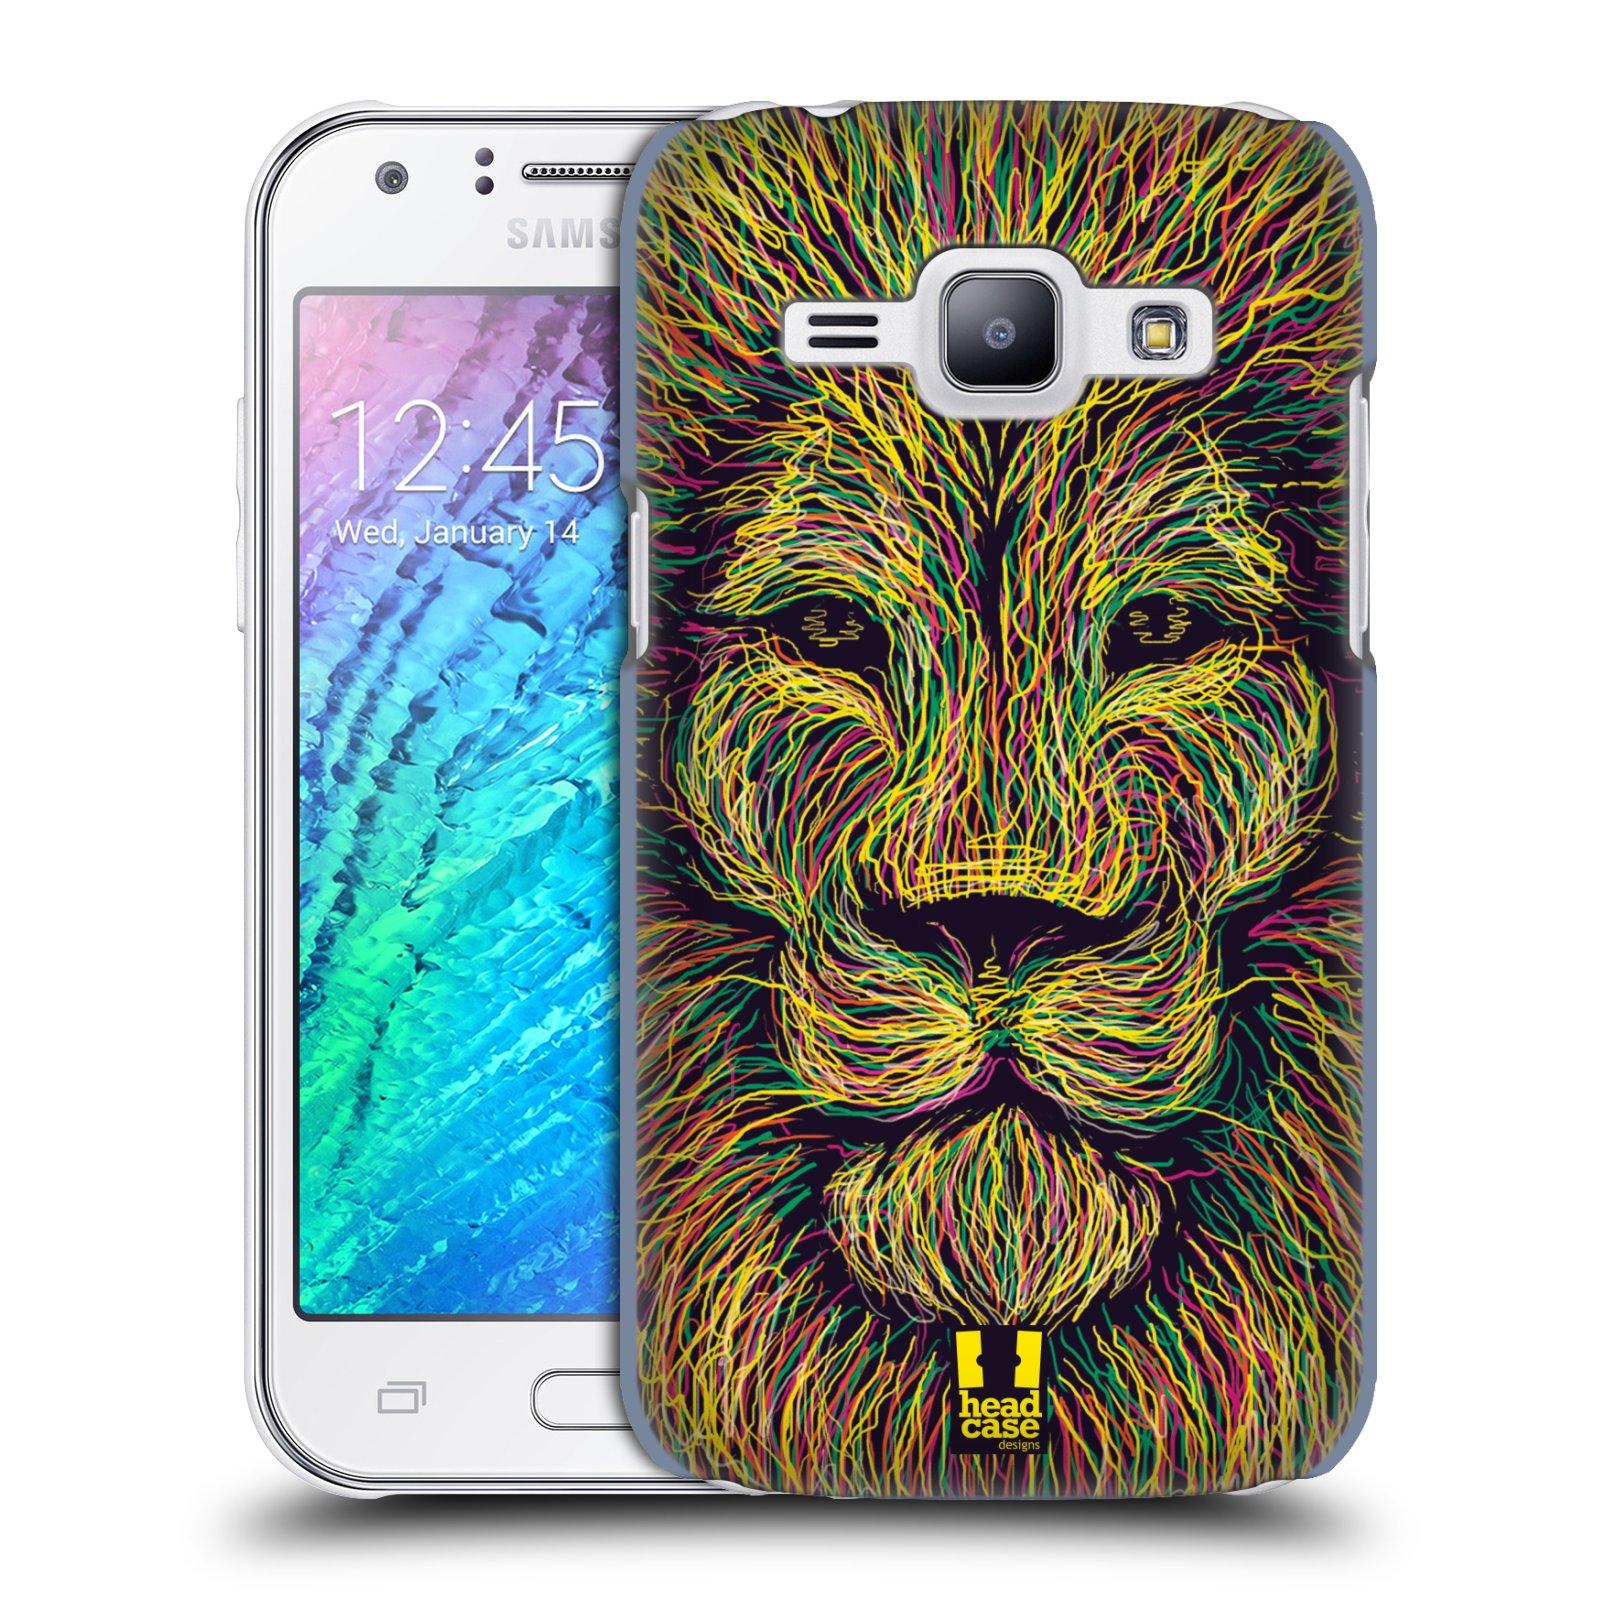 HEAD CASE plastový obal na mobil SAMSUNG Galaxy J1, J100 vzor zvíře čmáranice lev